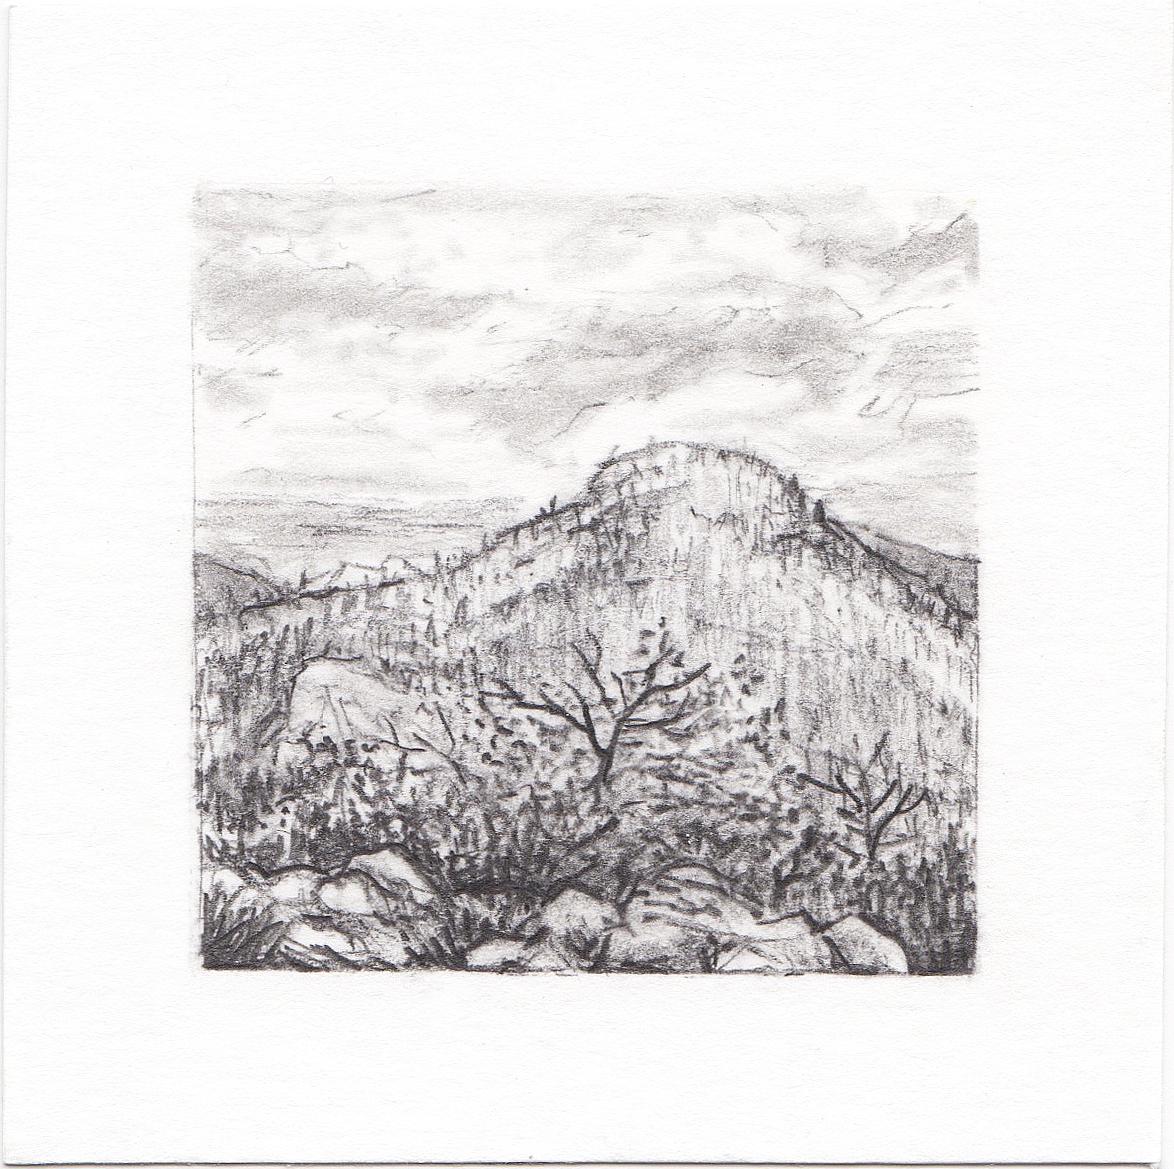 #45 Yosemite National Park, California | 3x3 | graphite